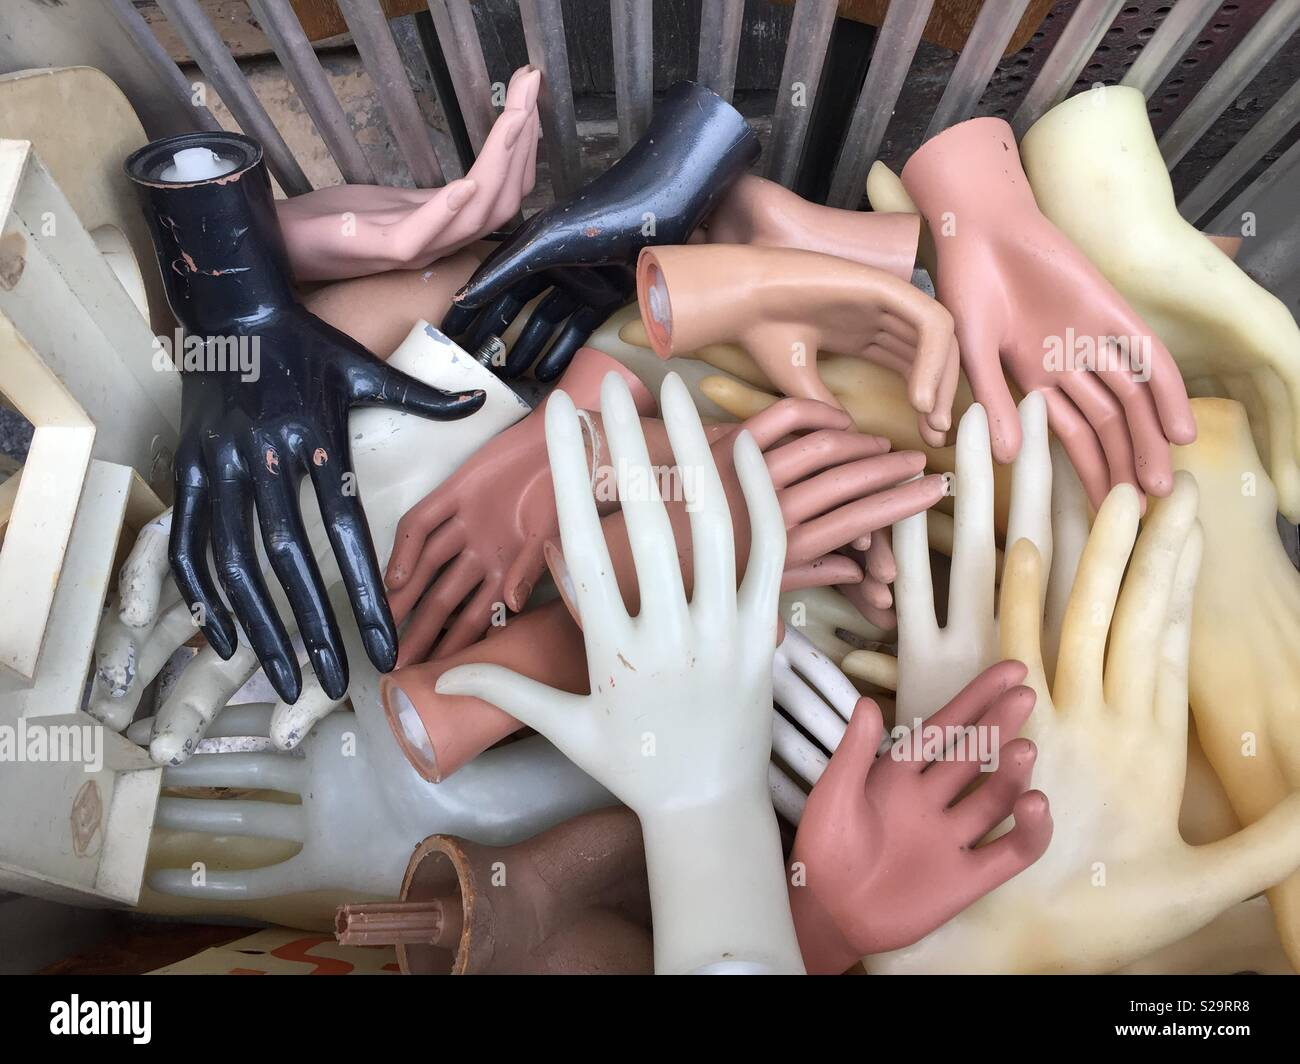 Mannequin Hands Stock Photos & Mannequin Hands Stock Images - Alamy